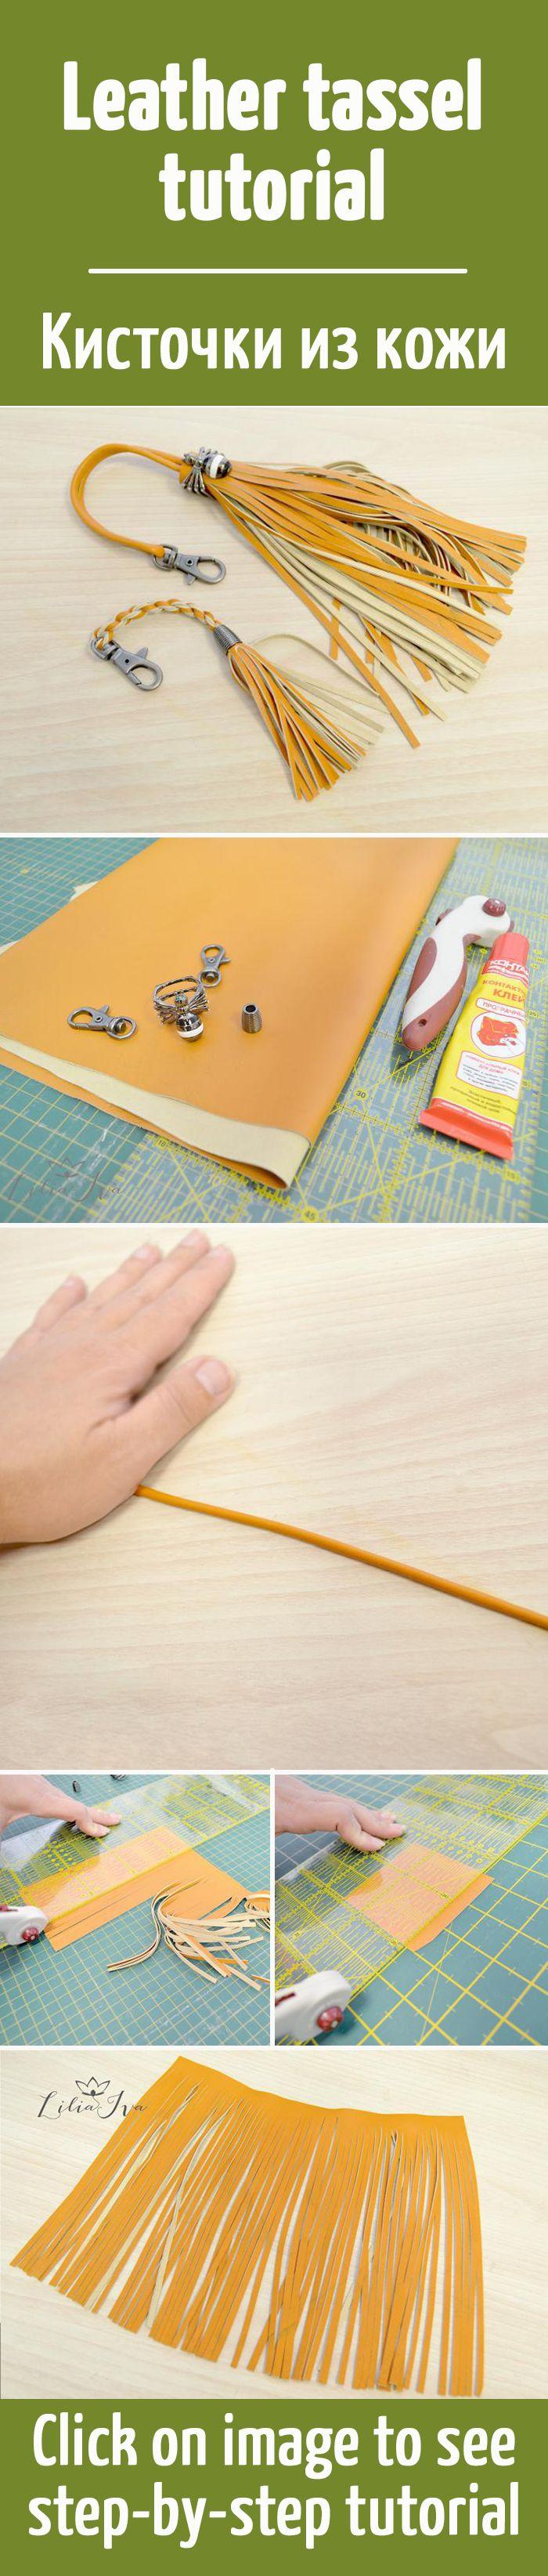 Делаем декоративные кисточки из кожи / Leather tassel tutorial